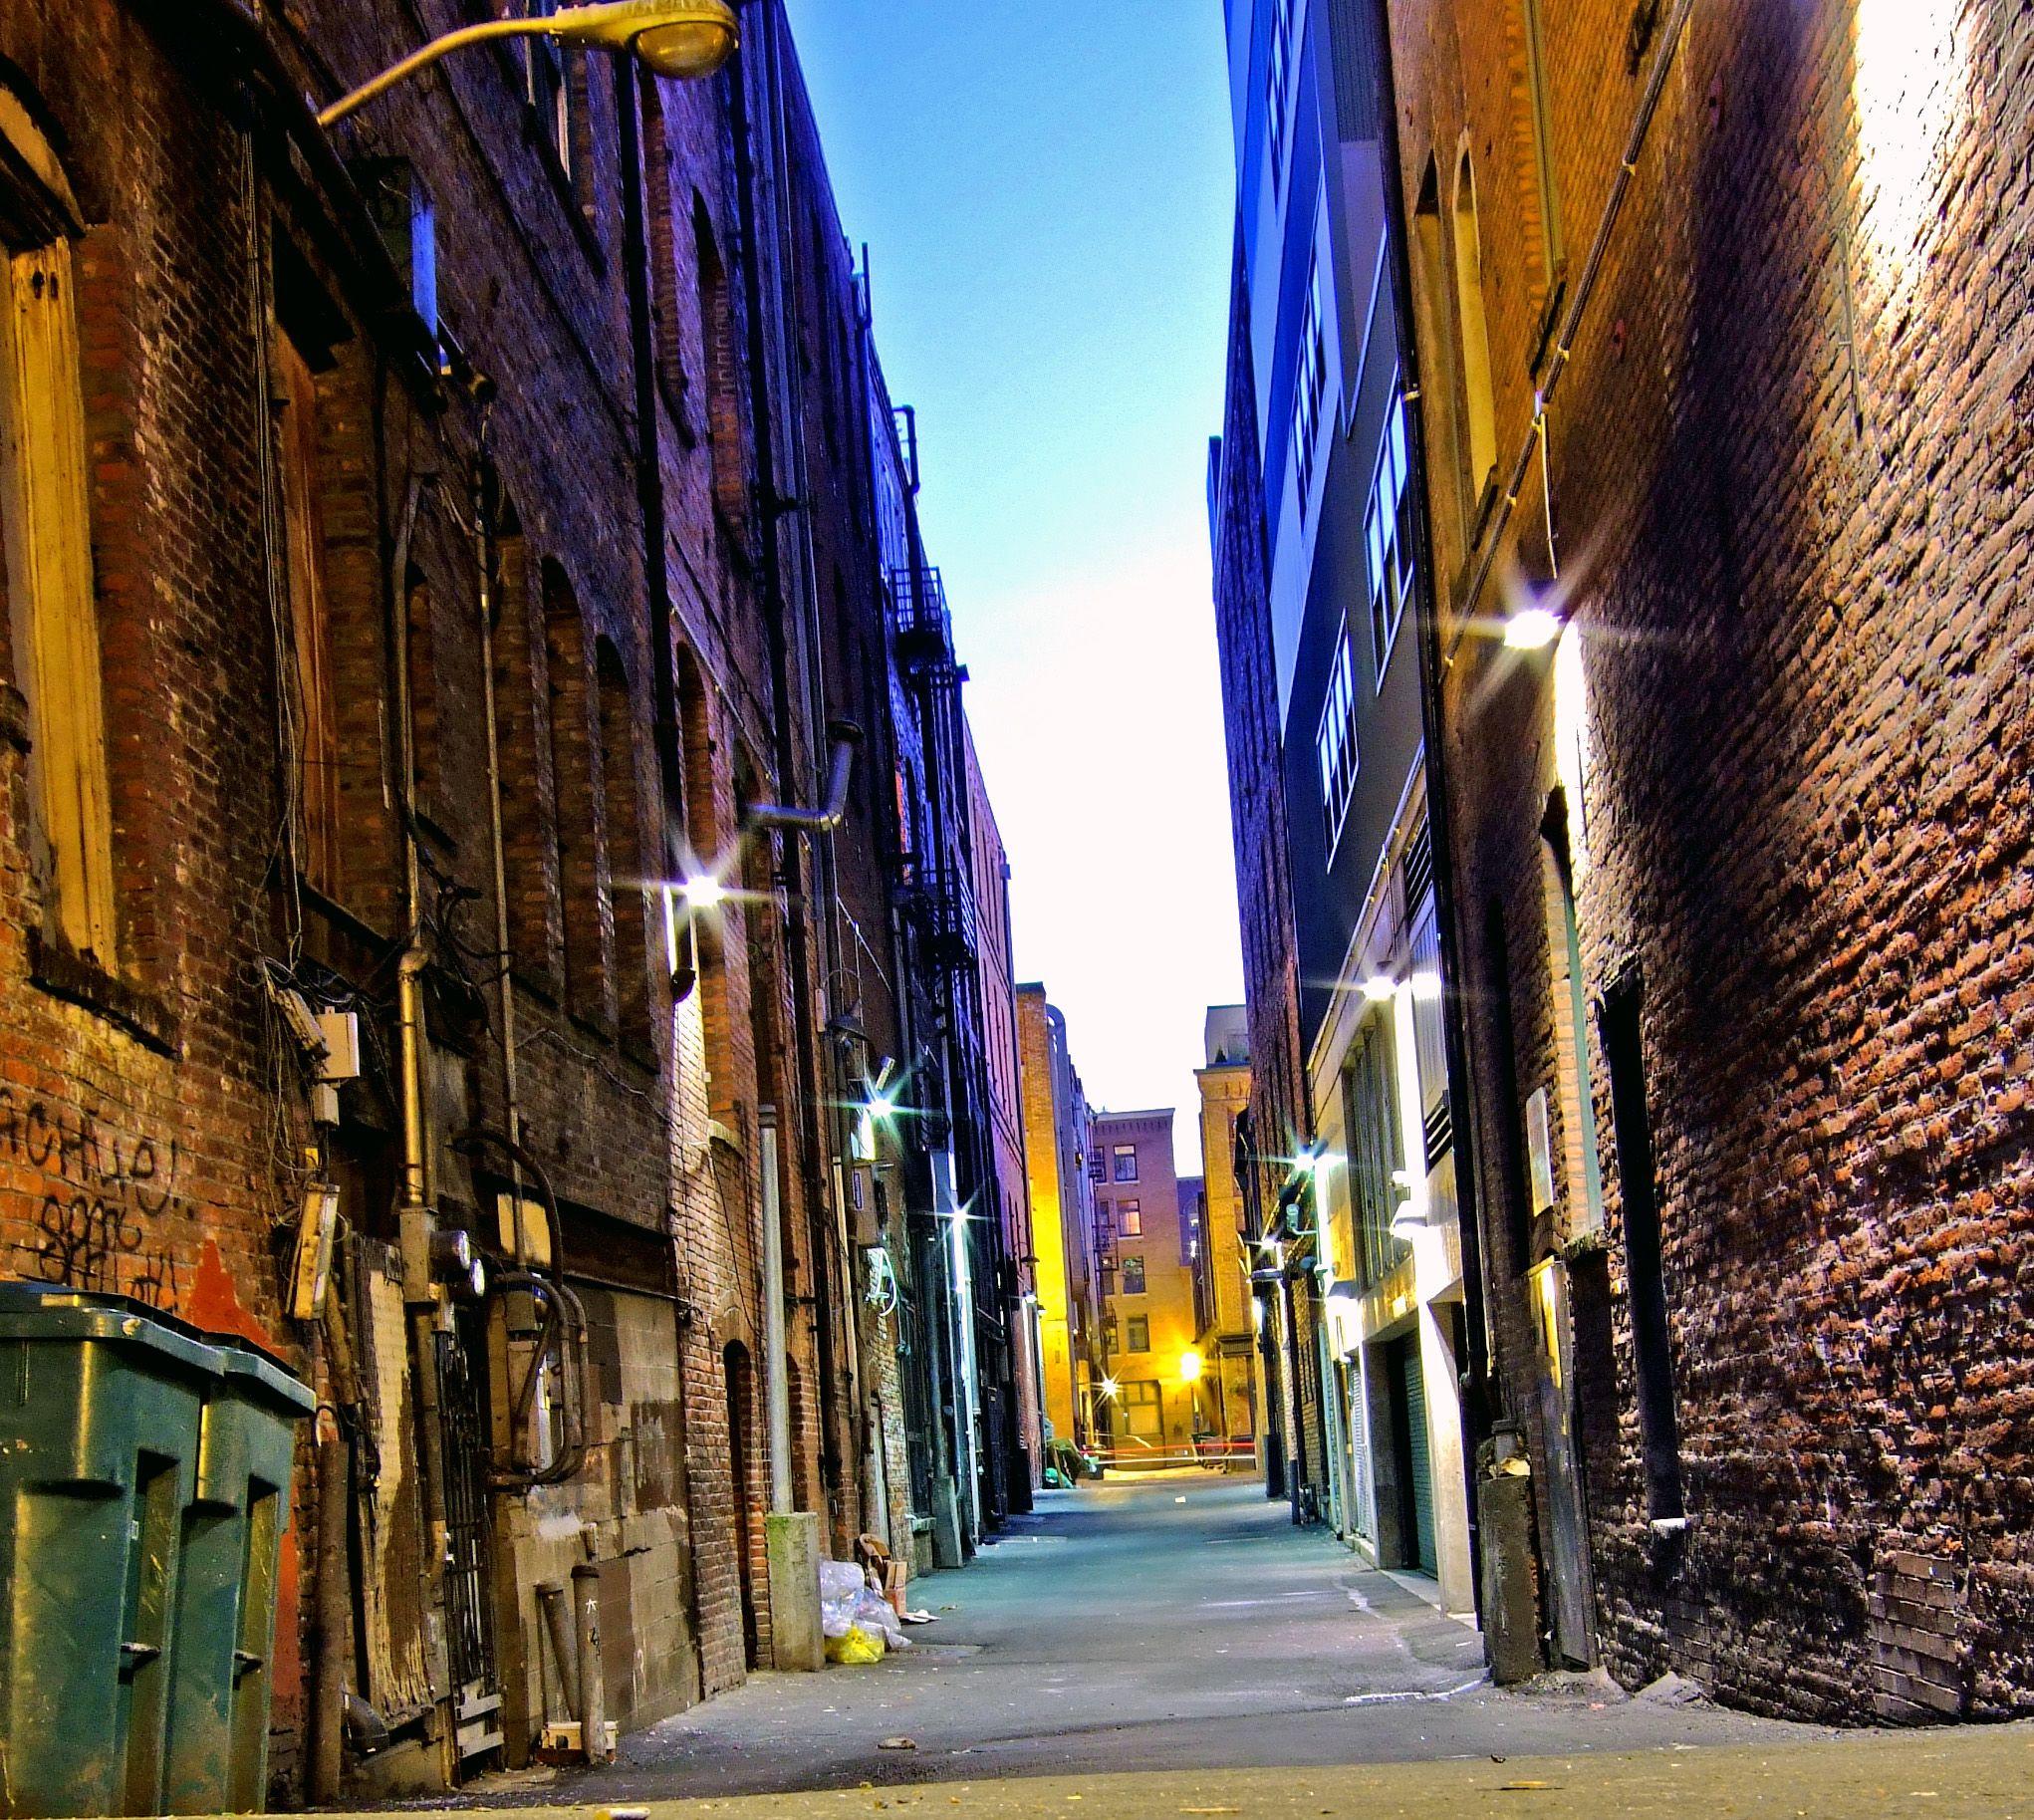 Street Light Colors: Pin By Sean Landry On City Nostalgia